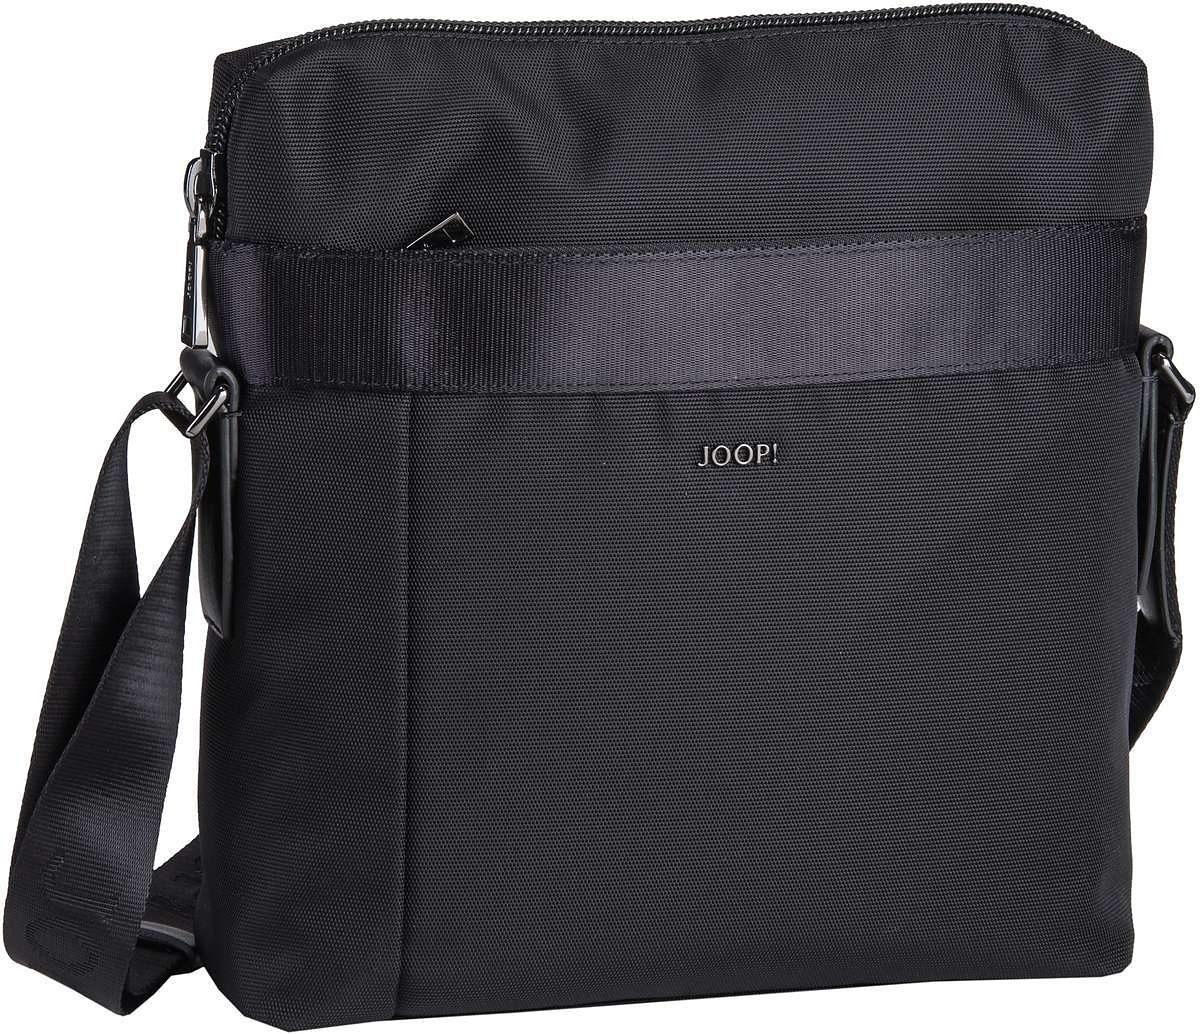 Joop Remus Pure Nylon Shoulder Bag